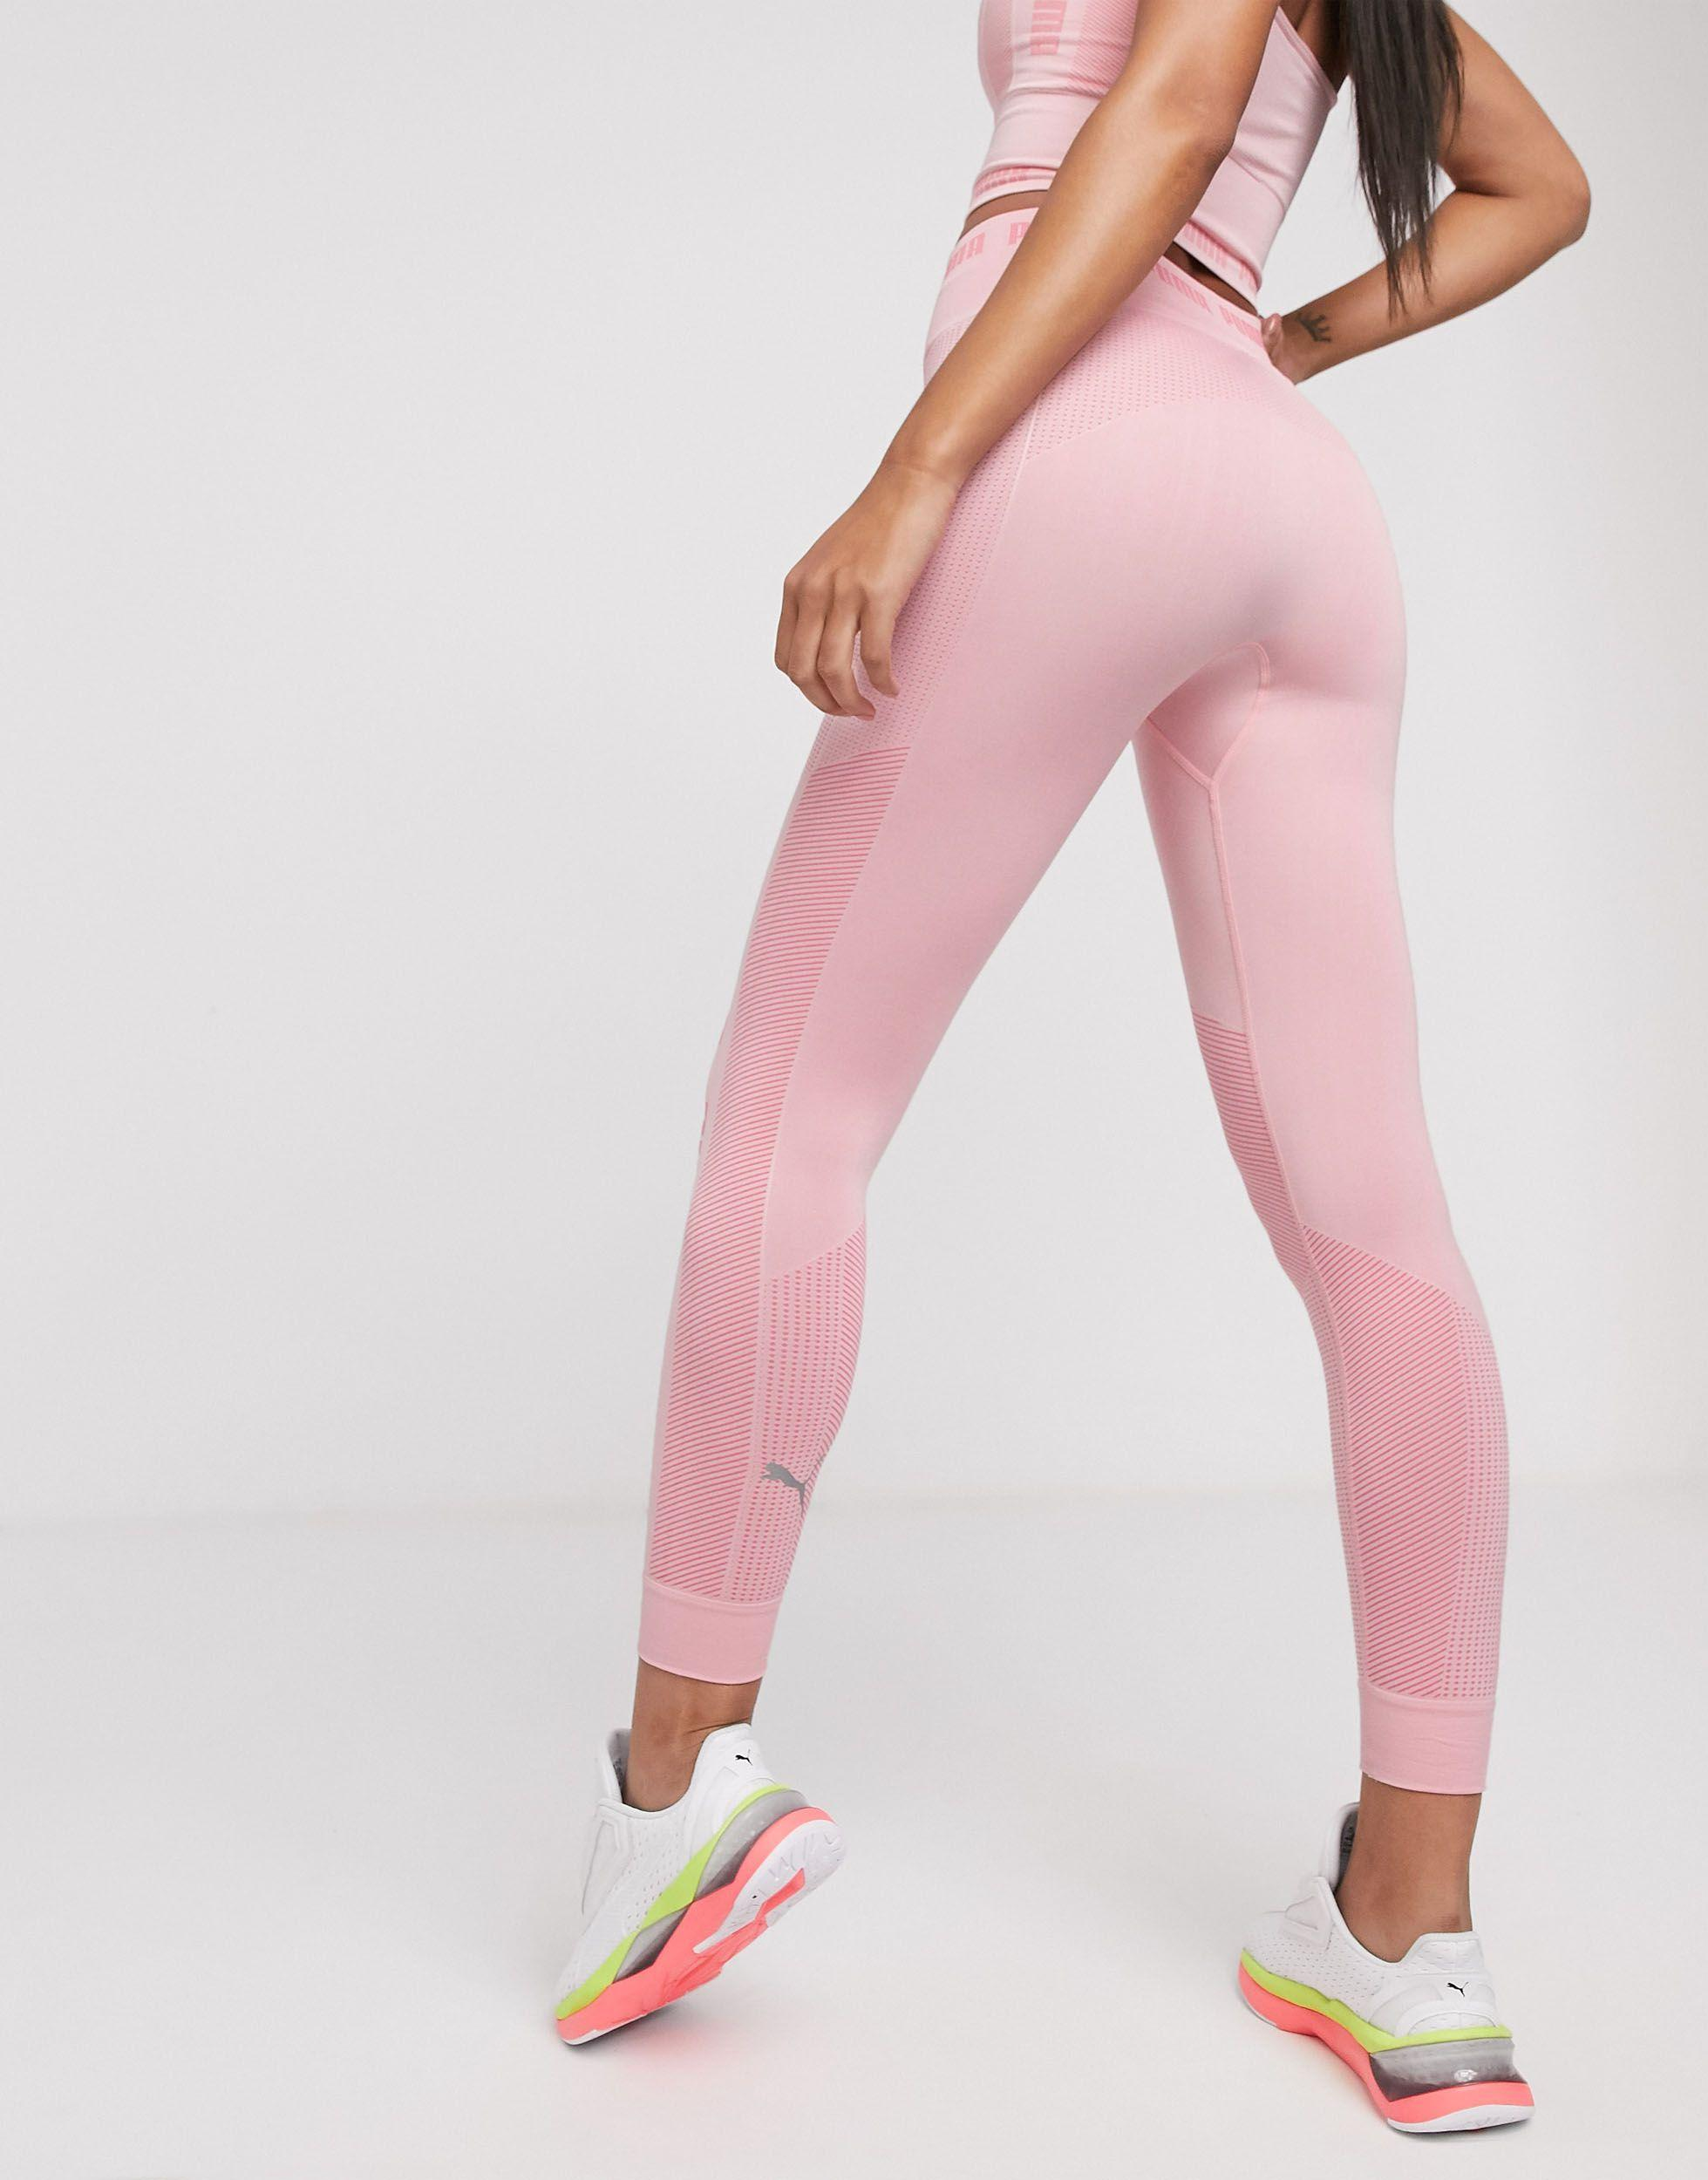 PUMA Seamless leggings in Pink - Save 2% - Lyst